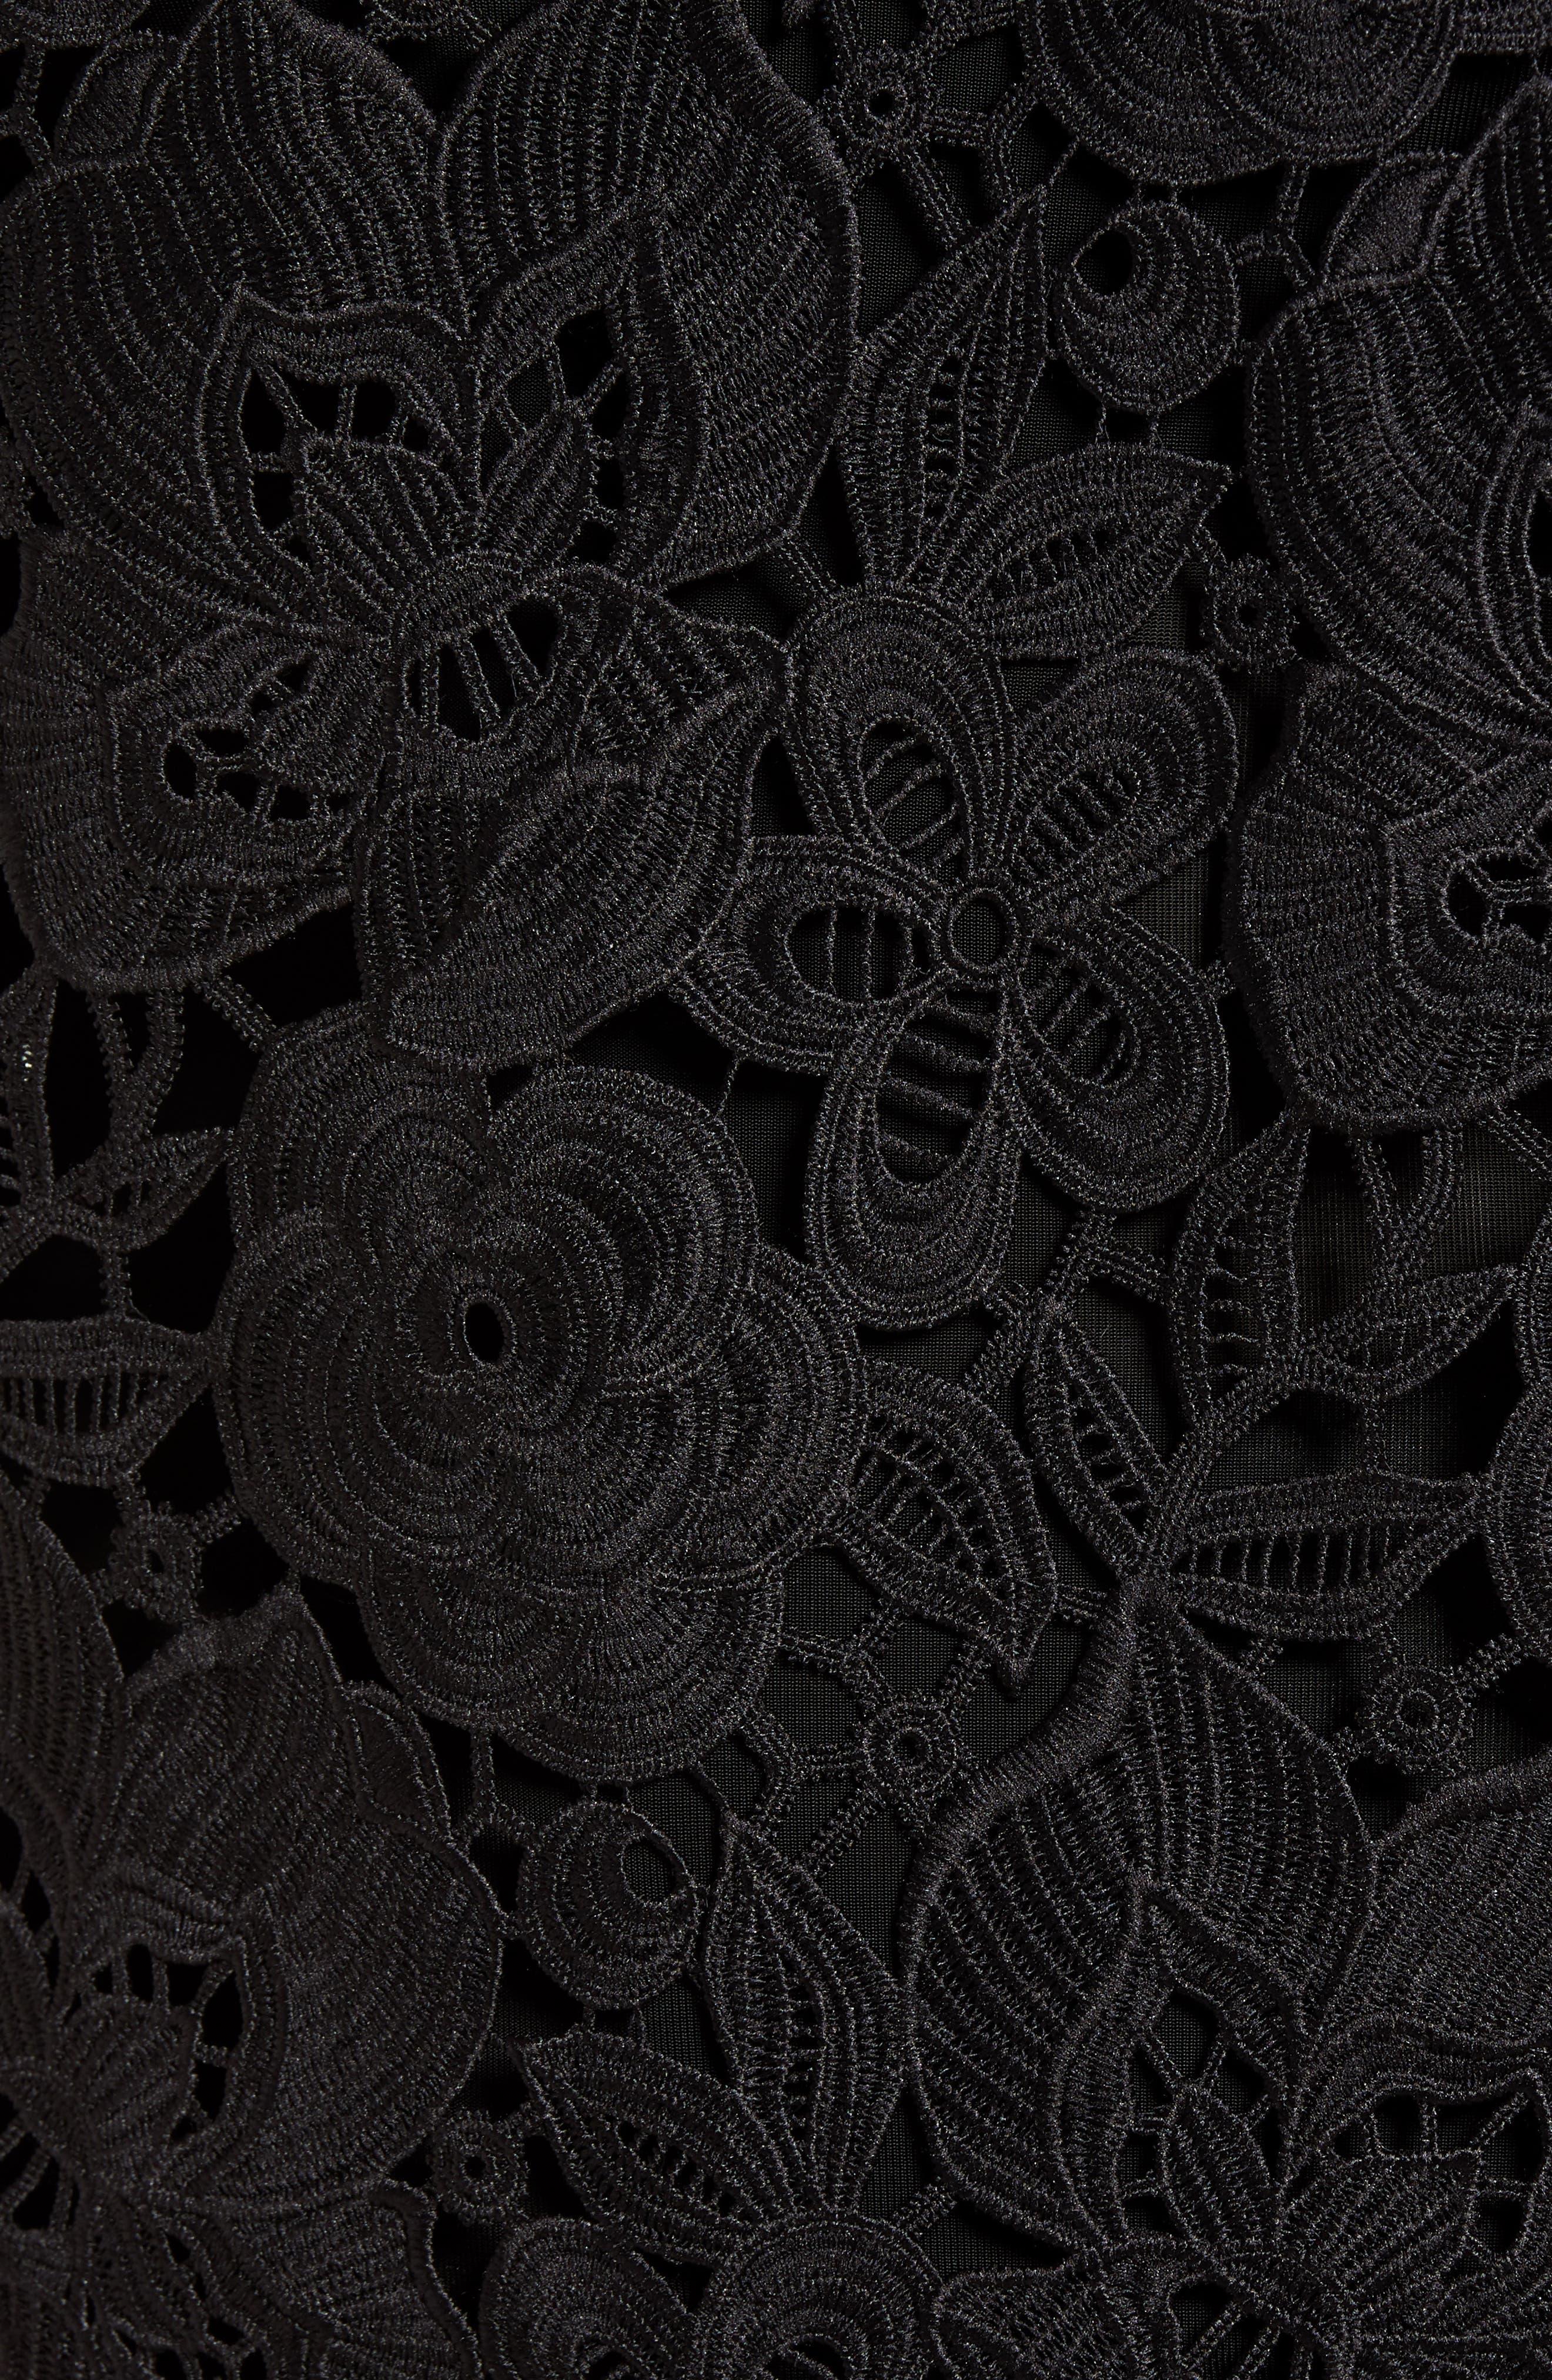 Puff Sleeve Lace Blouse,                             Alternate thumbnail 6, color,                             Black